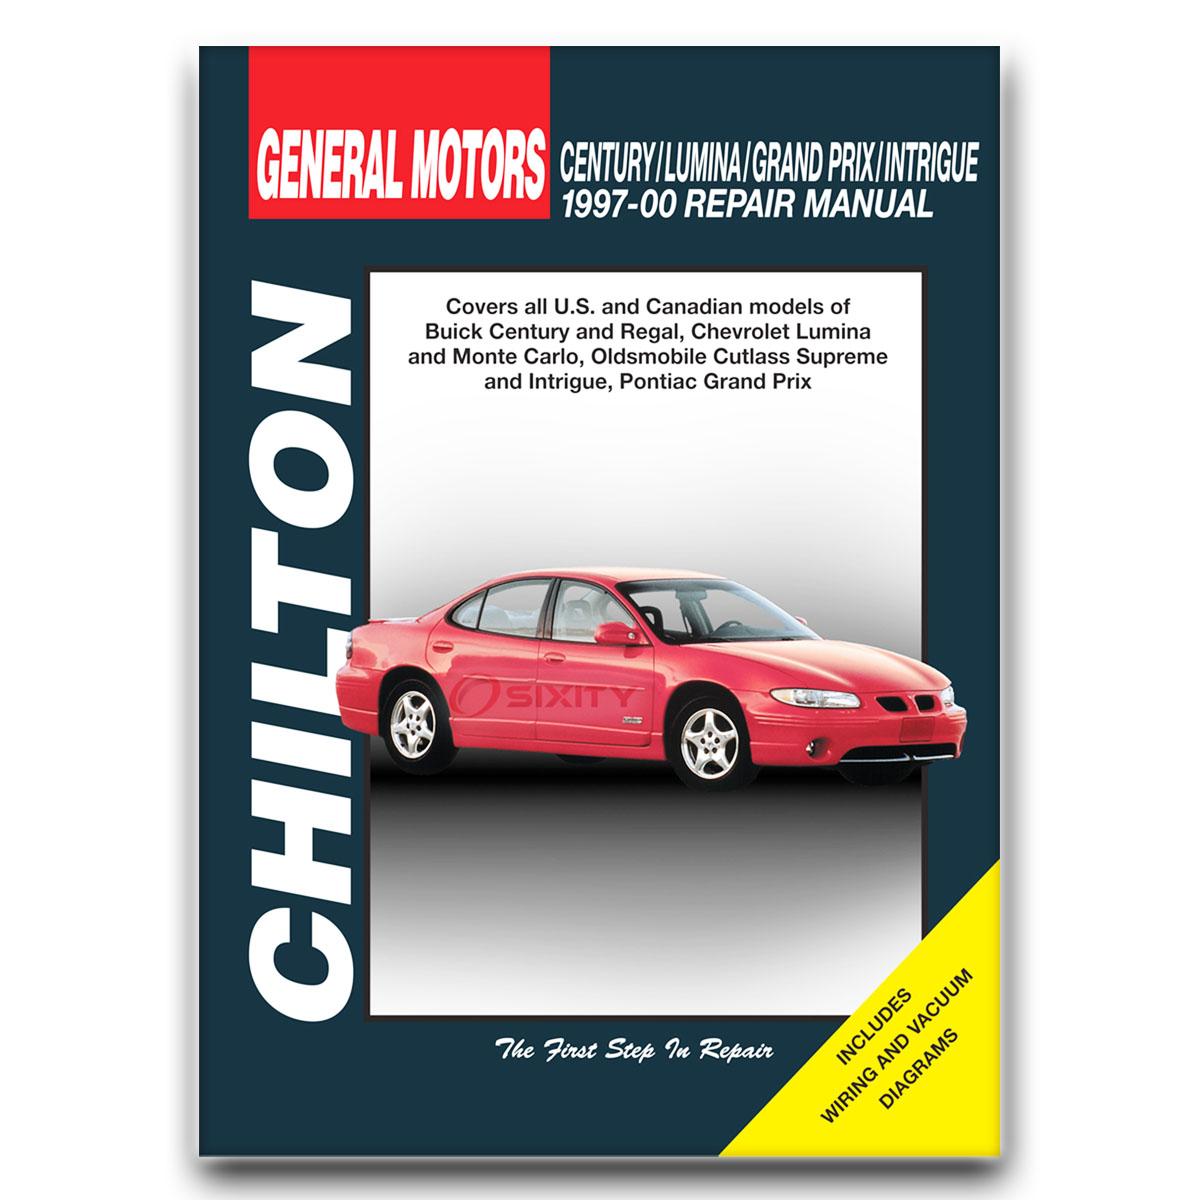 99 pontiac grand prix repair manual open source user manual u2022 rh dramatic varieties com 2006 Grand Prix GTP Grand Prix Headlights